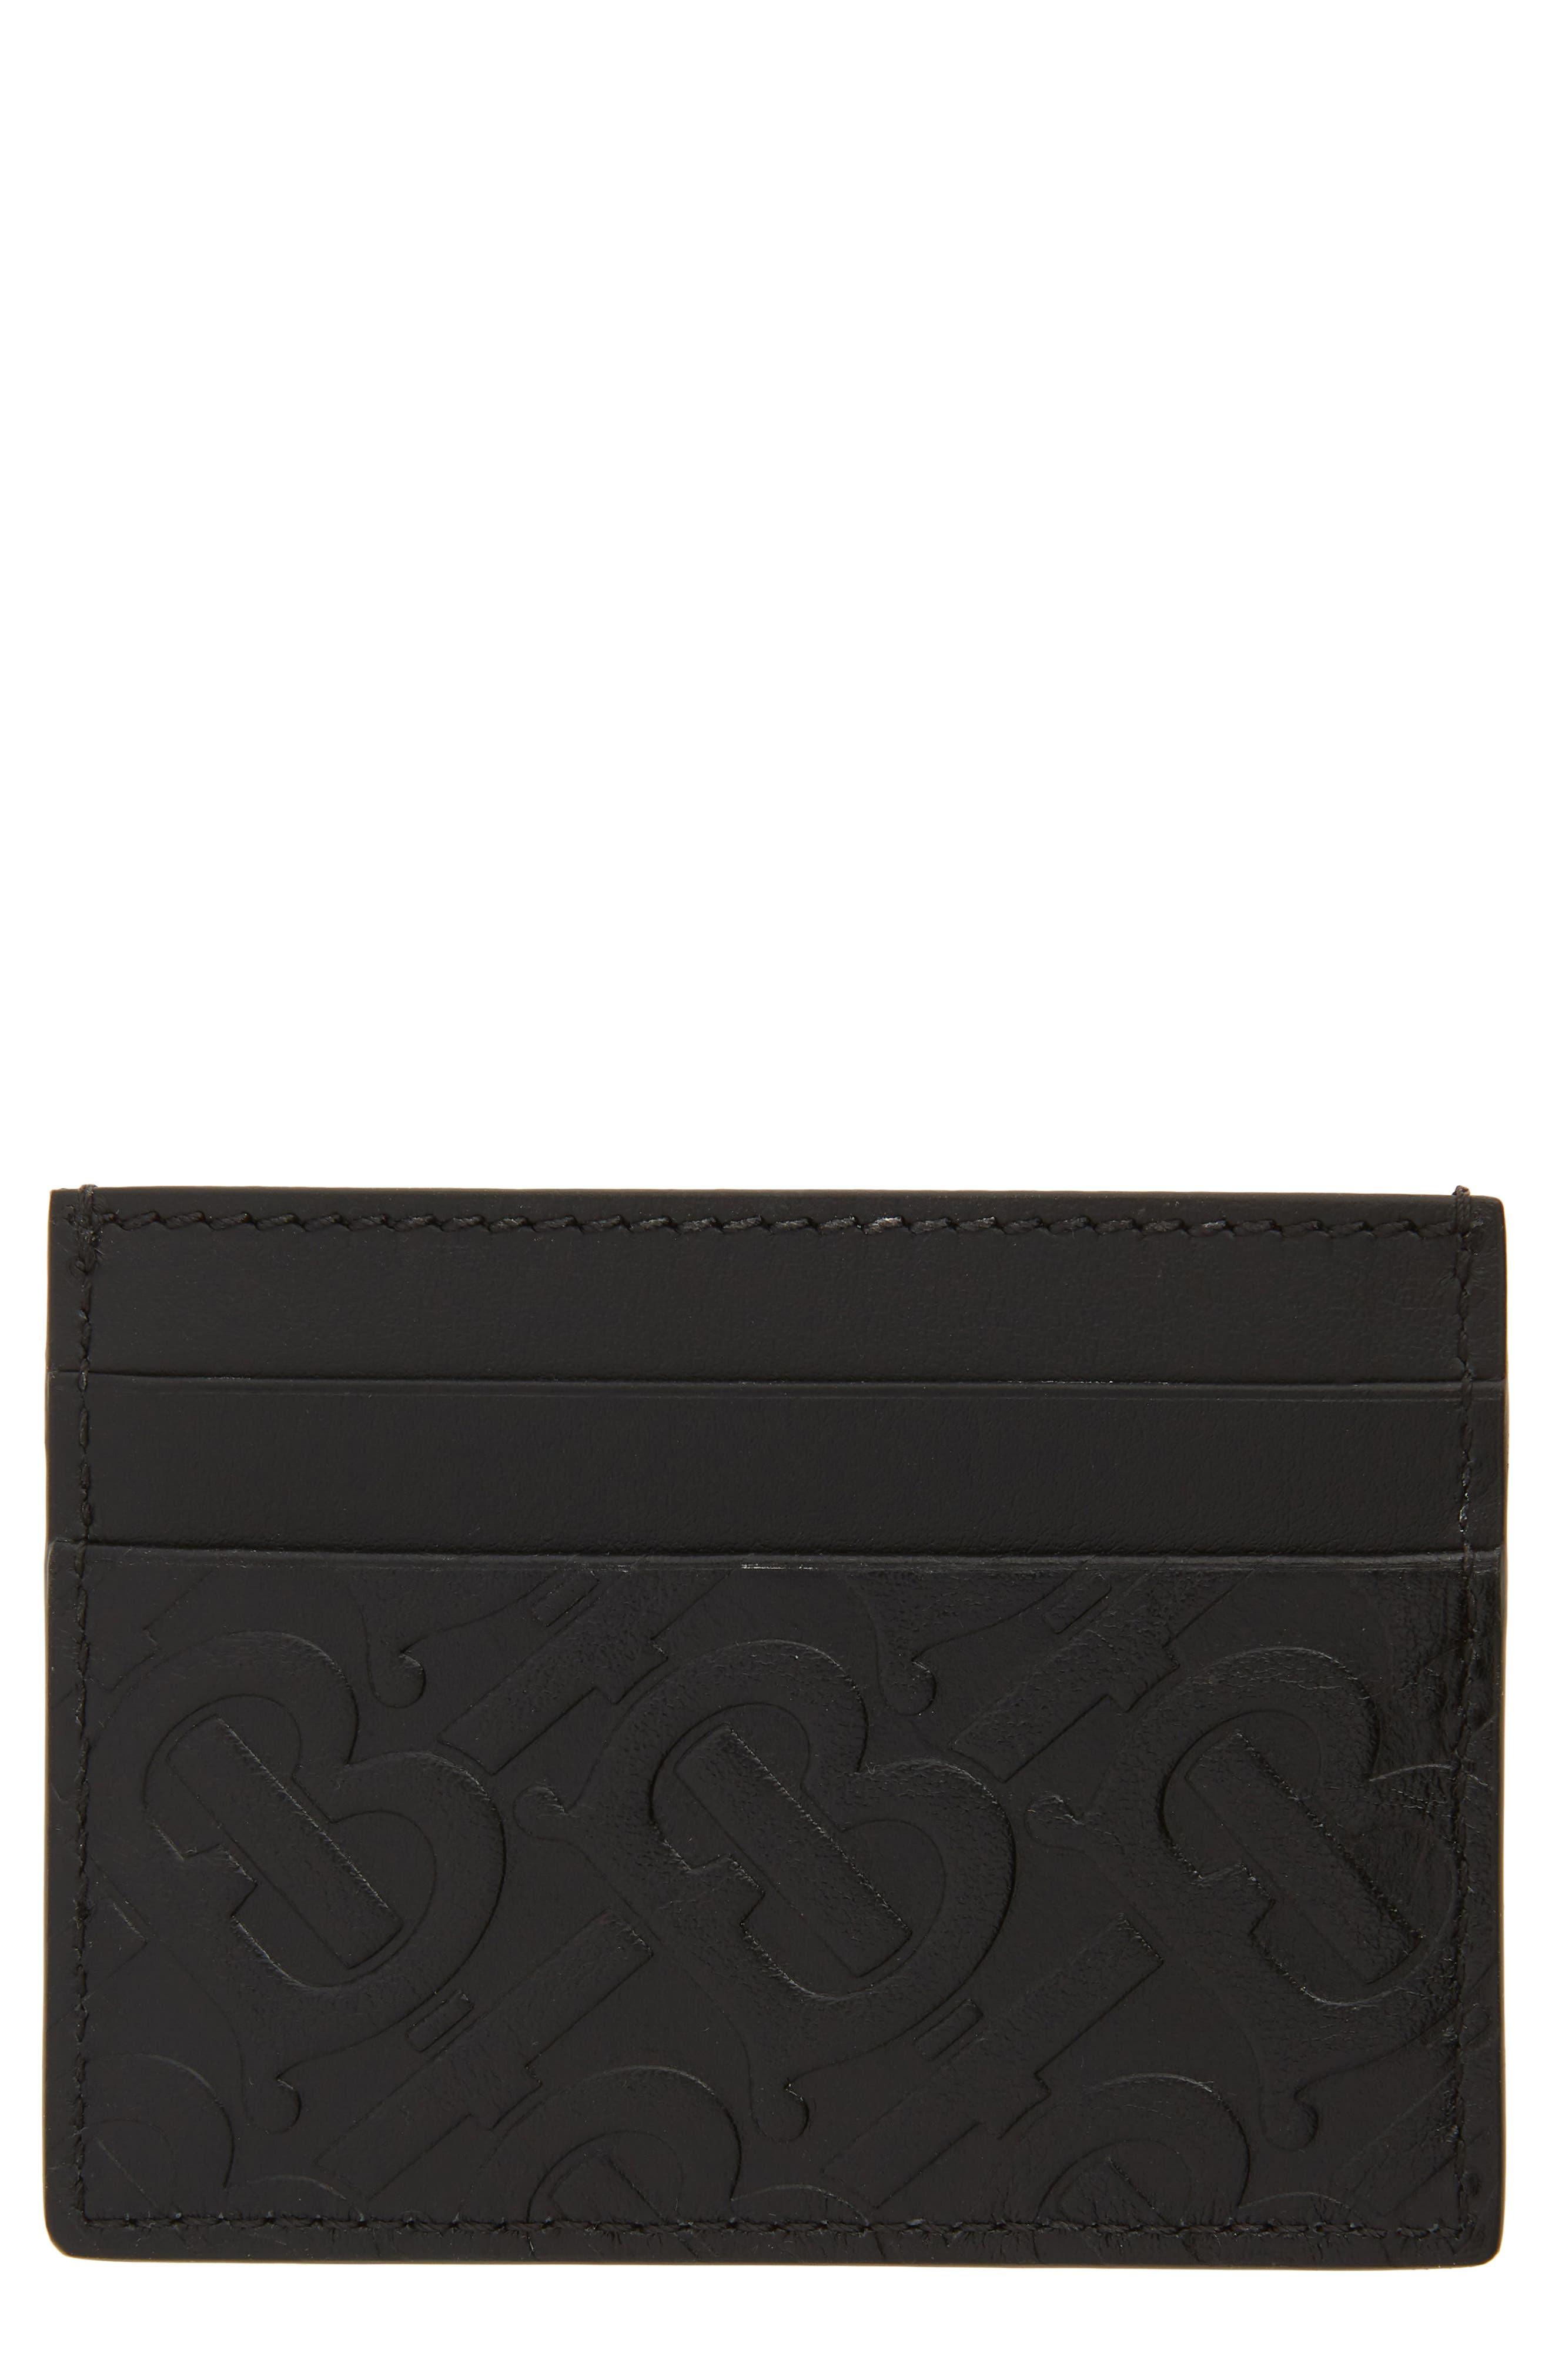 BURBERRY, Sandon Monogram Leather Card Case, Alternate thumbnail 2, color, BLACK